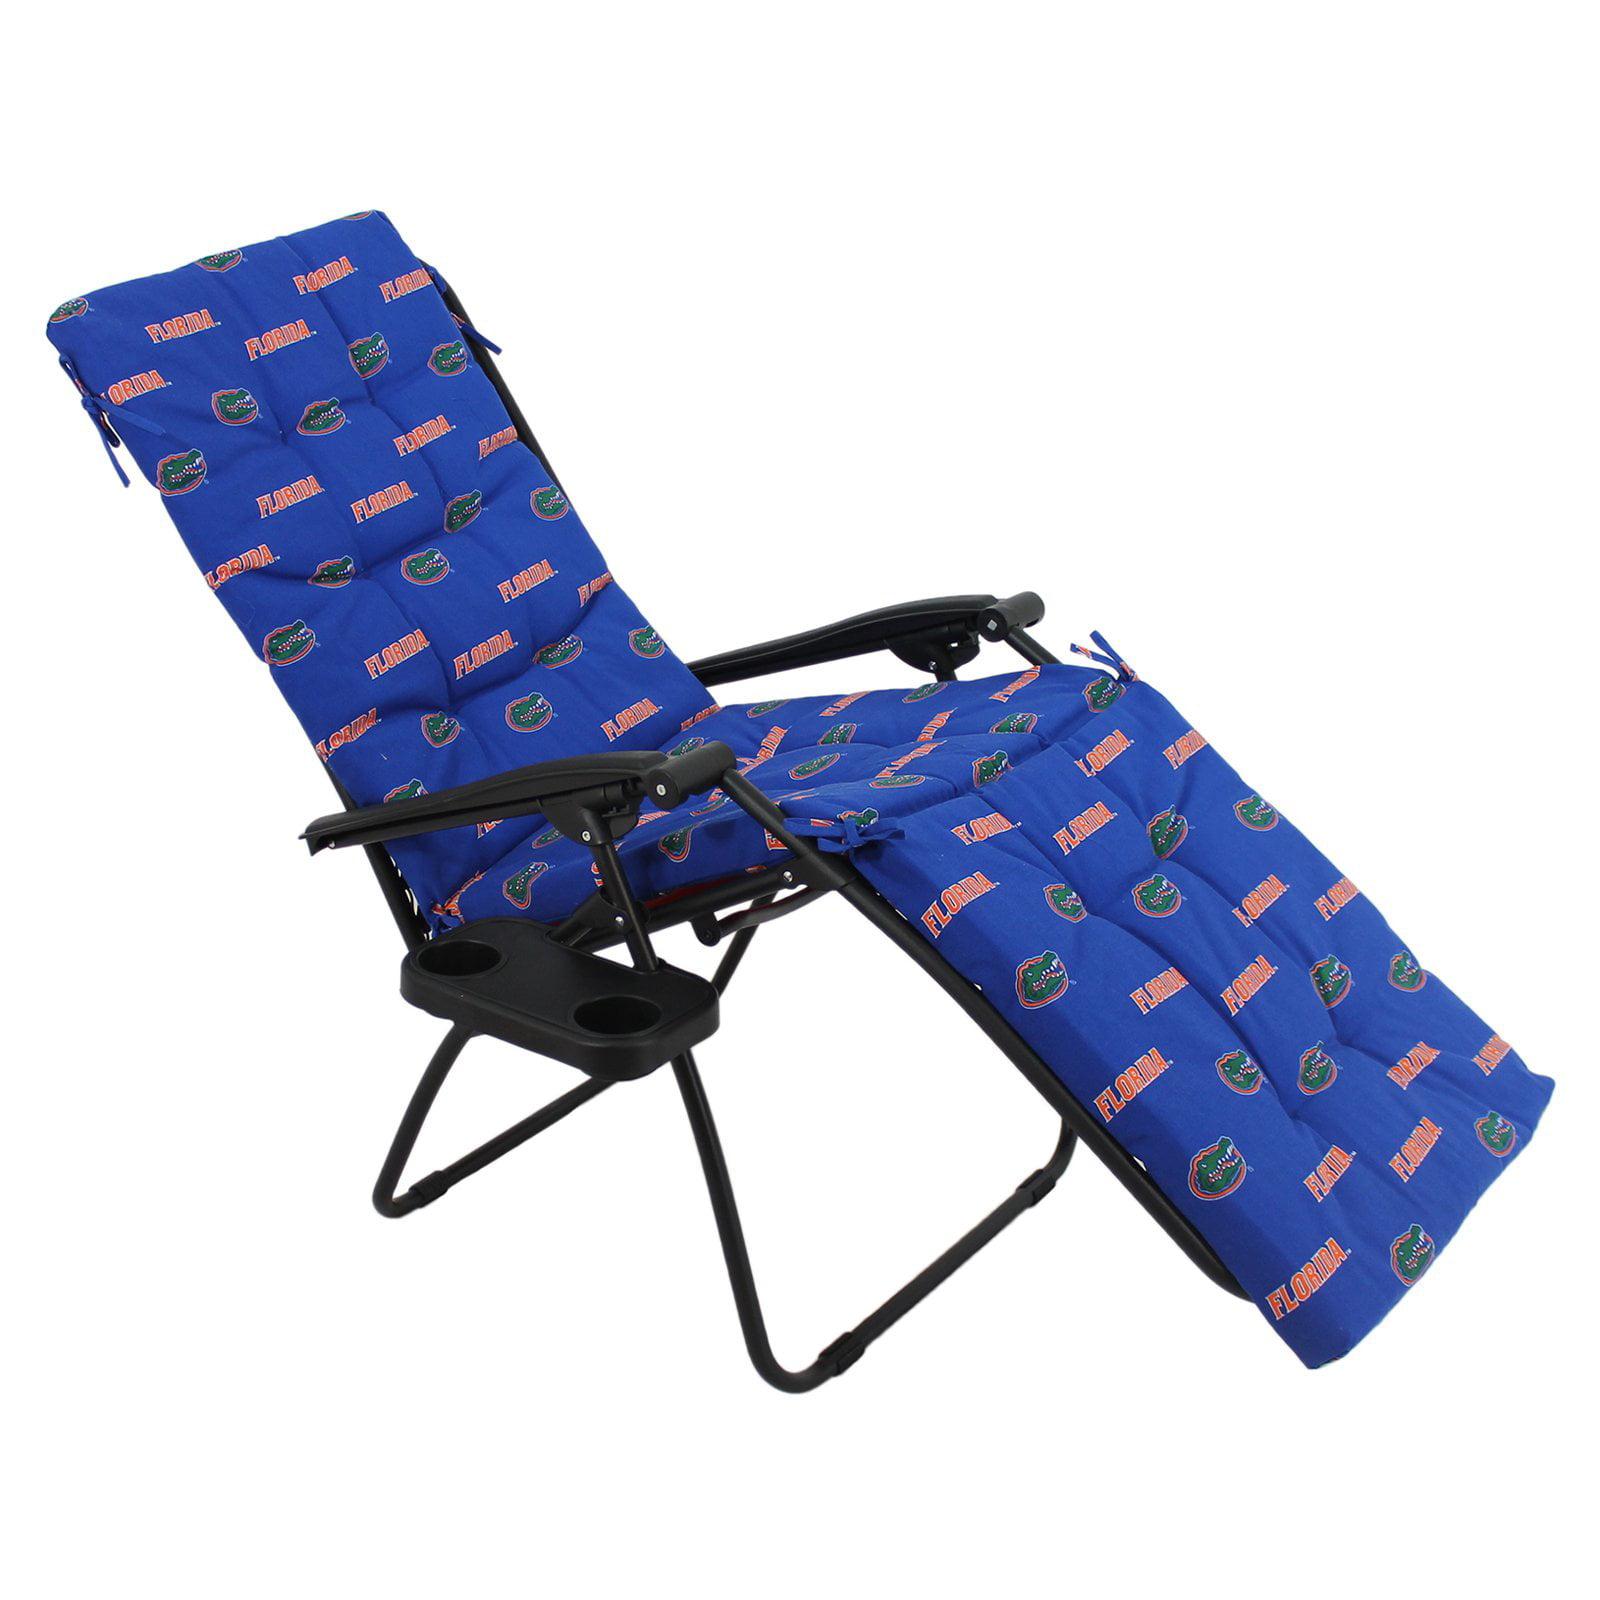 Outdoor Zero Gravity Chair Cushion - Walmart.com  sc 1 st  Walmart & College Covers 72 x 20 in. Outdoor Zero Gravity Chair Cushion ...